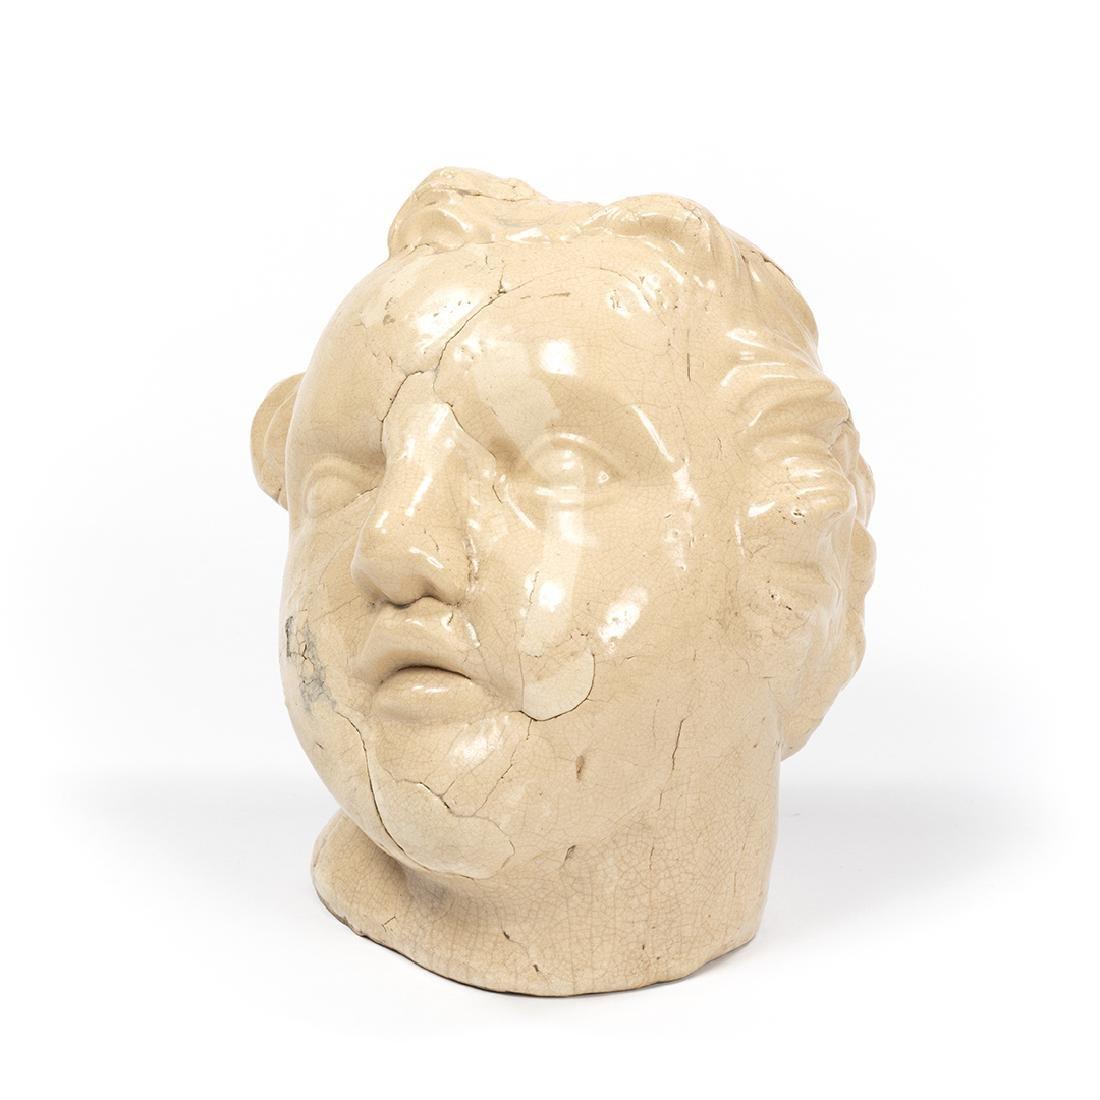 Large Porcelain Cherub Head - 2